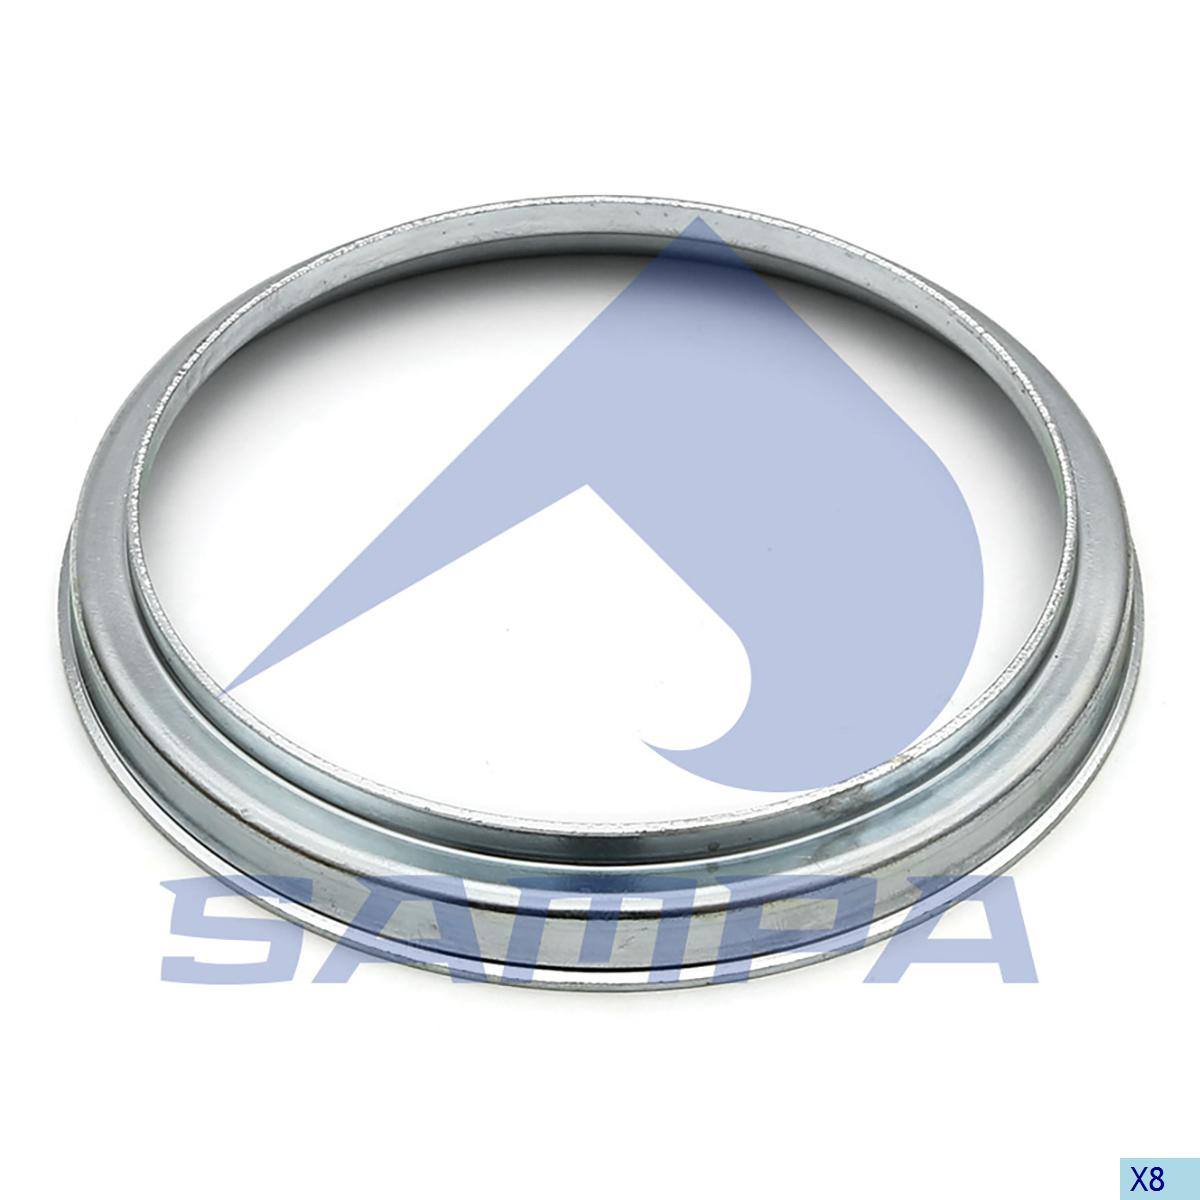 Spacer Ring, Wheel Hub, Mercedes, Power Unit